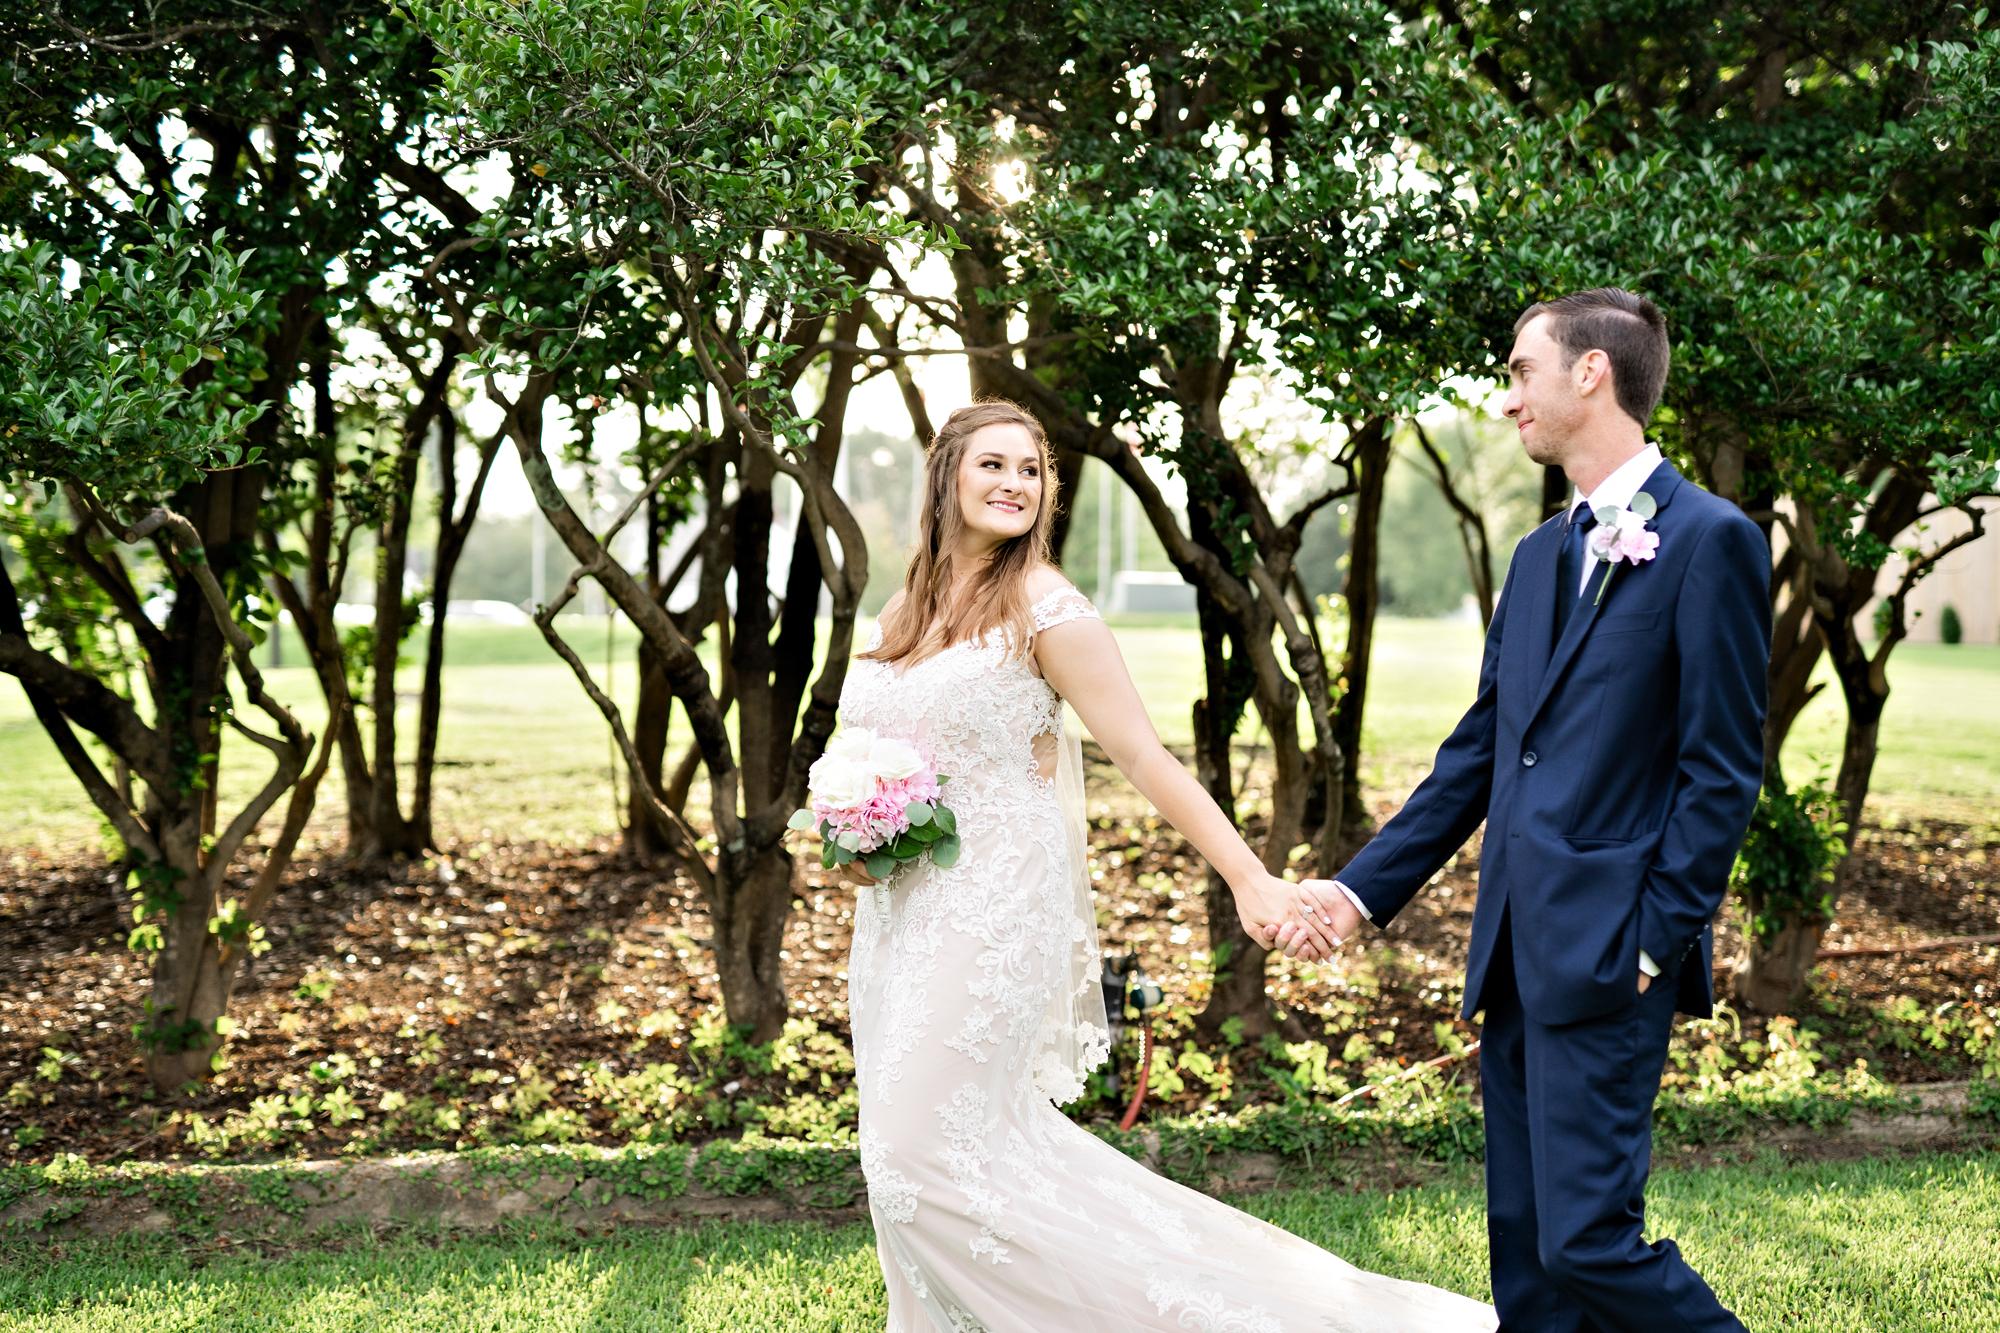 Alabama-Wedding-Photographer-Nick-Drollette-148.jpg